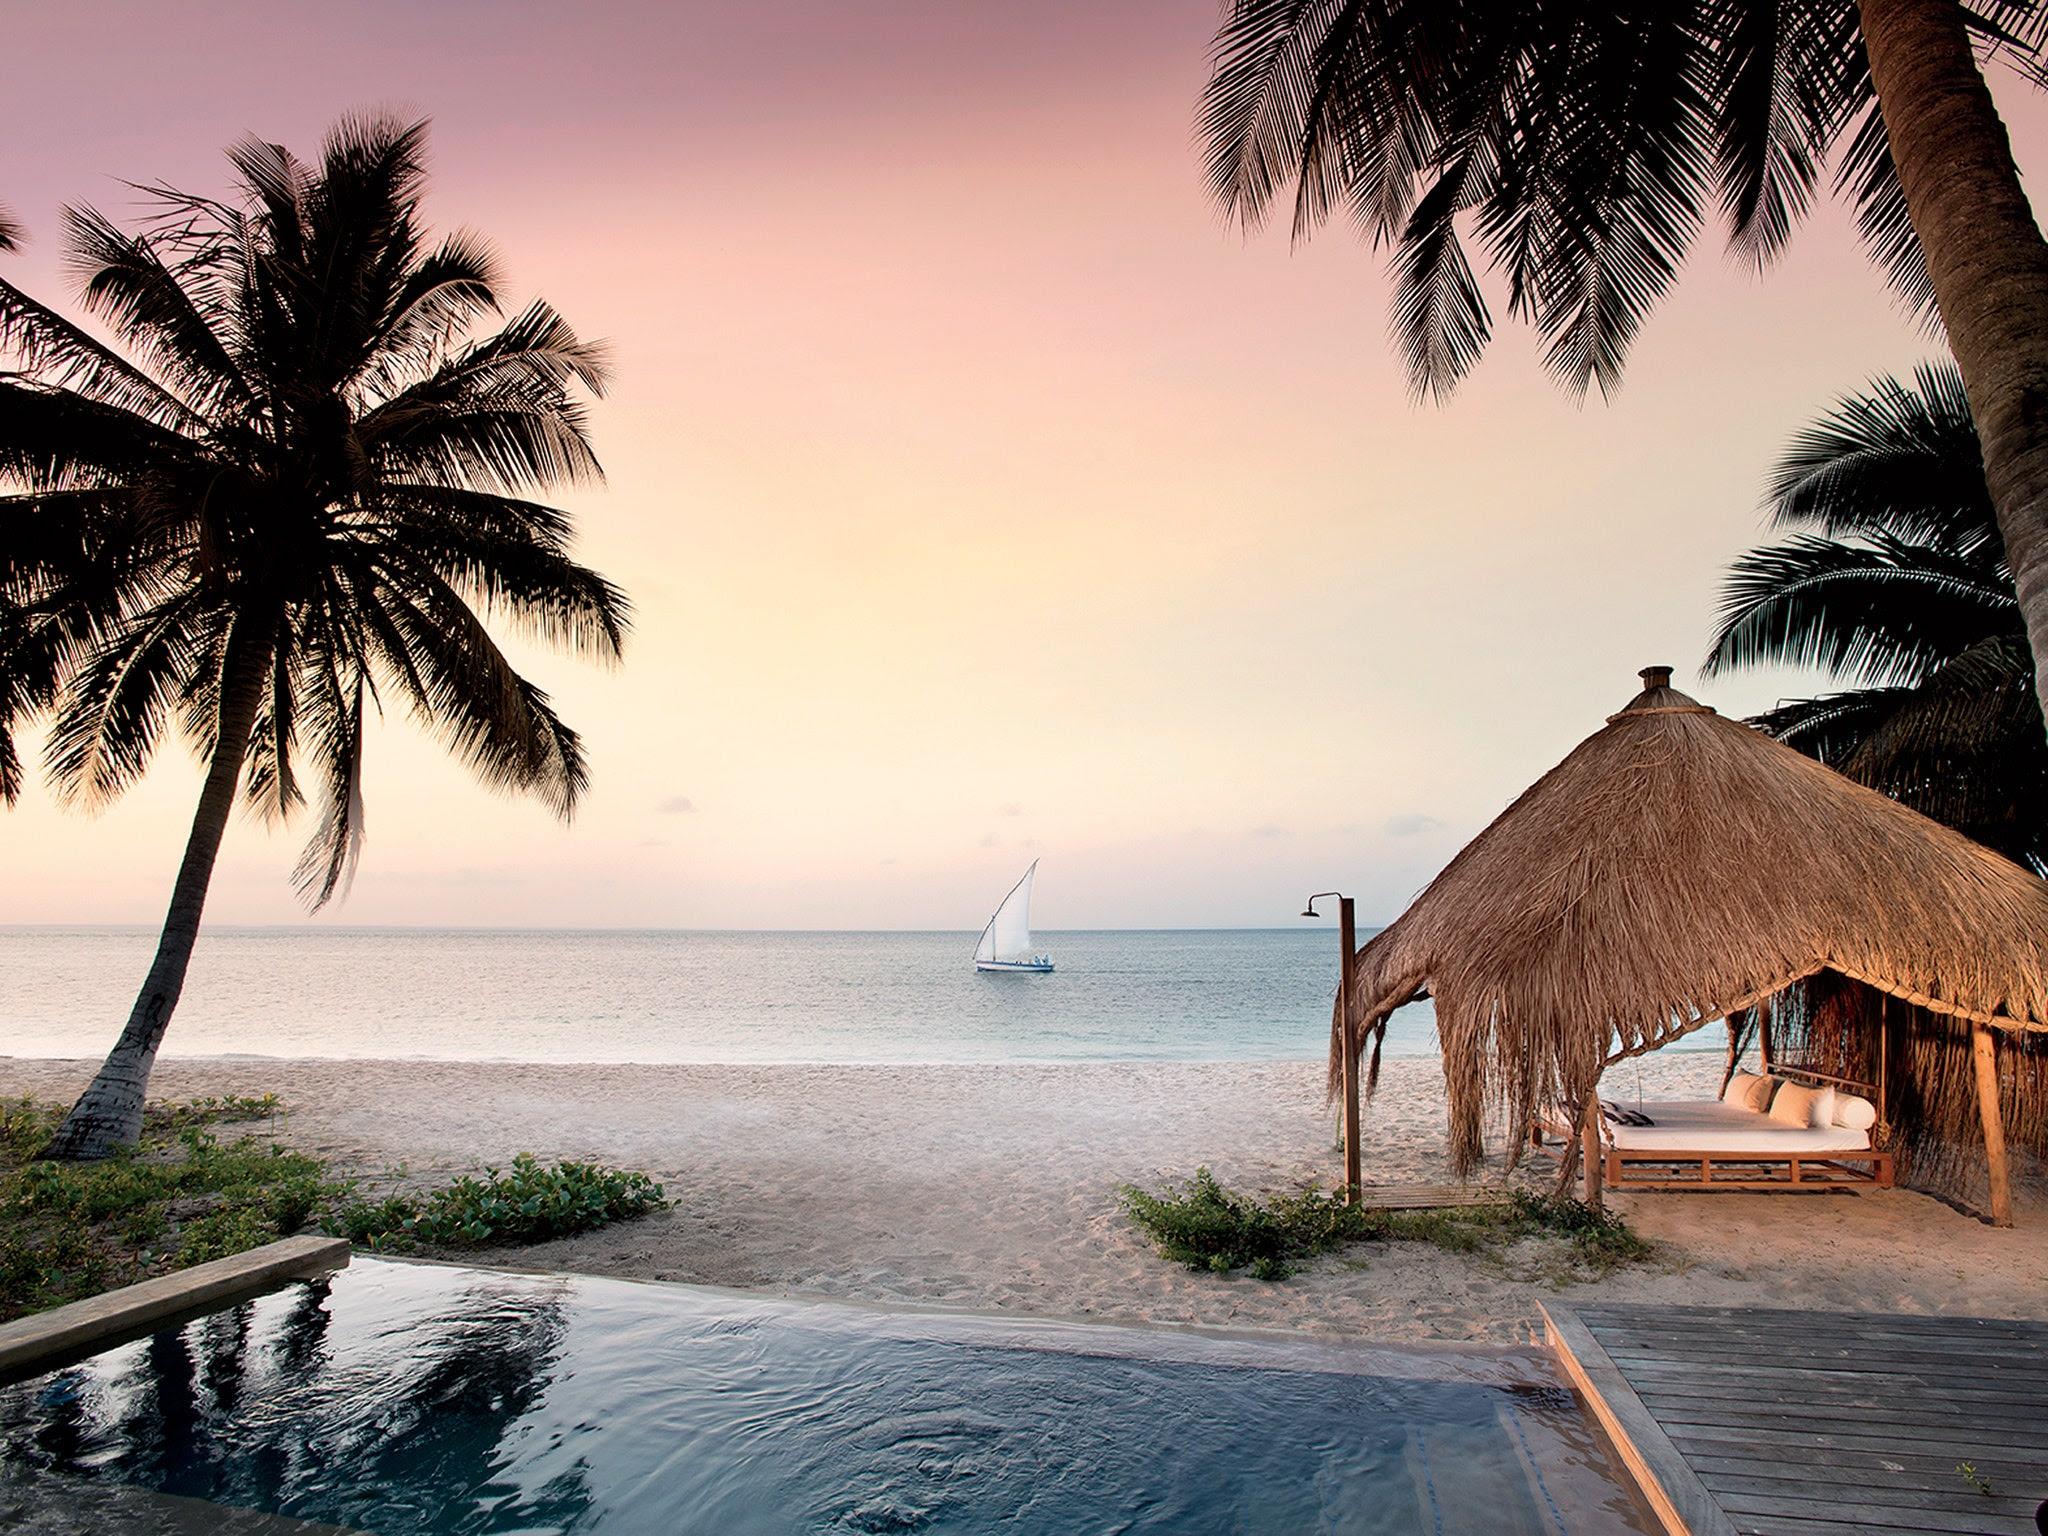 9 Best New Beach Resorts in the World Hot List 2016